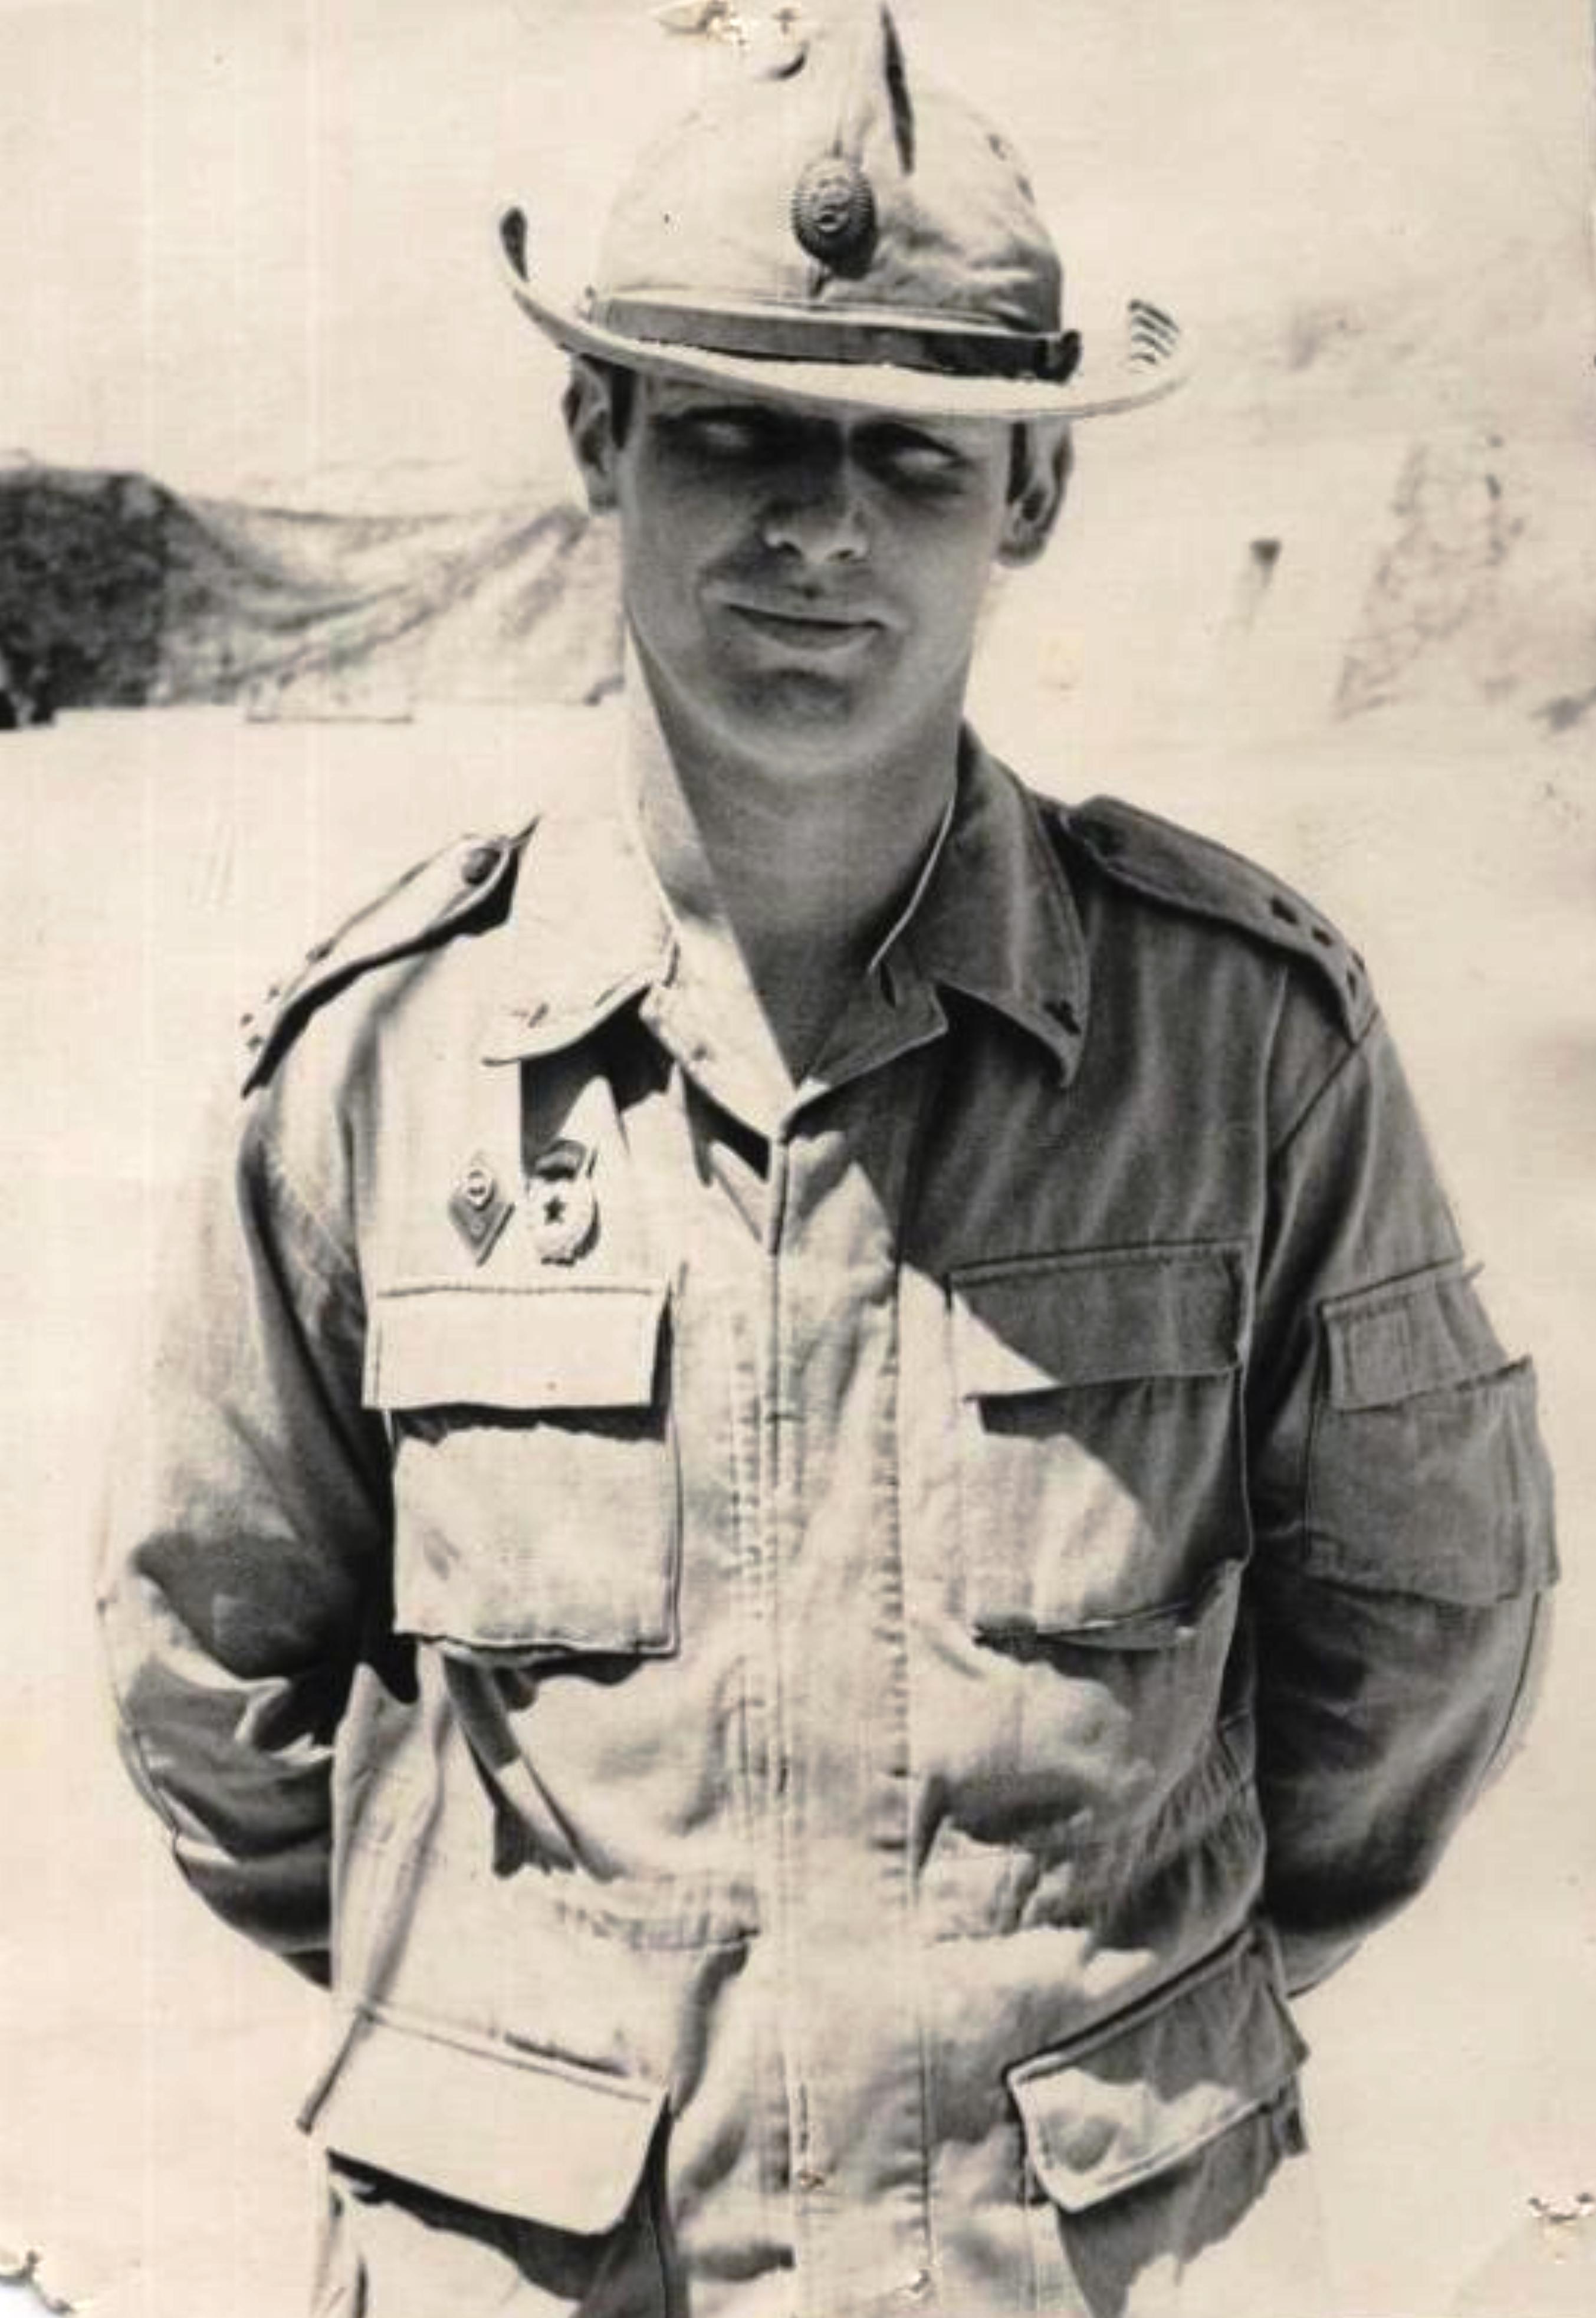 Командир парашютно-десантного батальона, гвардии капитан Фёдоров